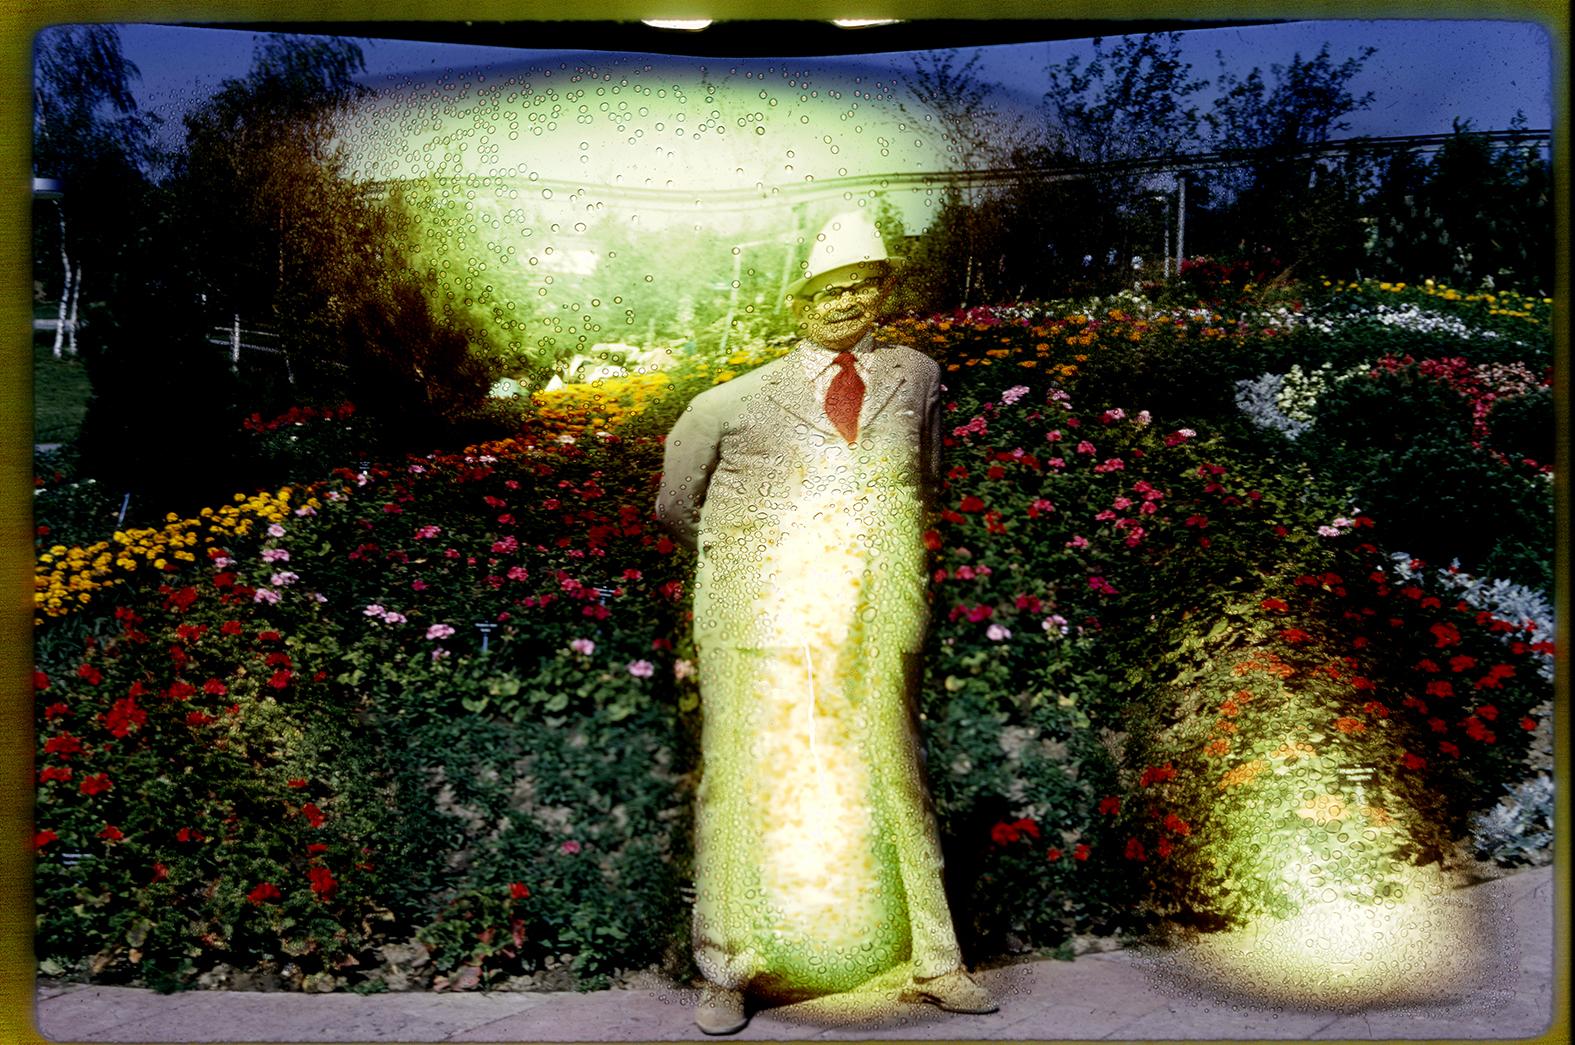 man in the garden.jpg